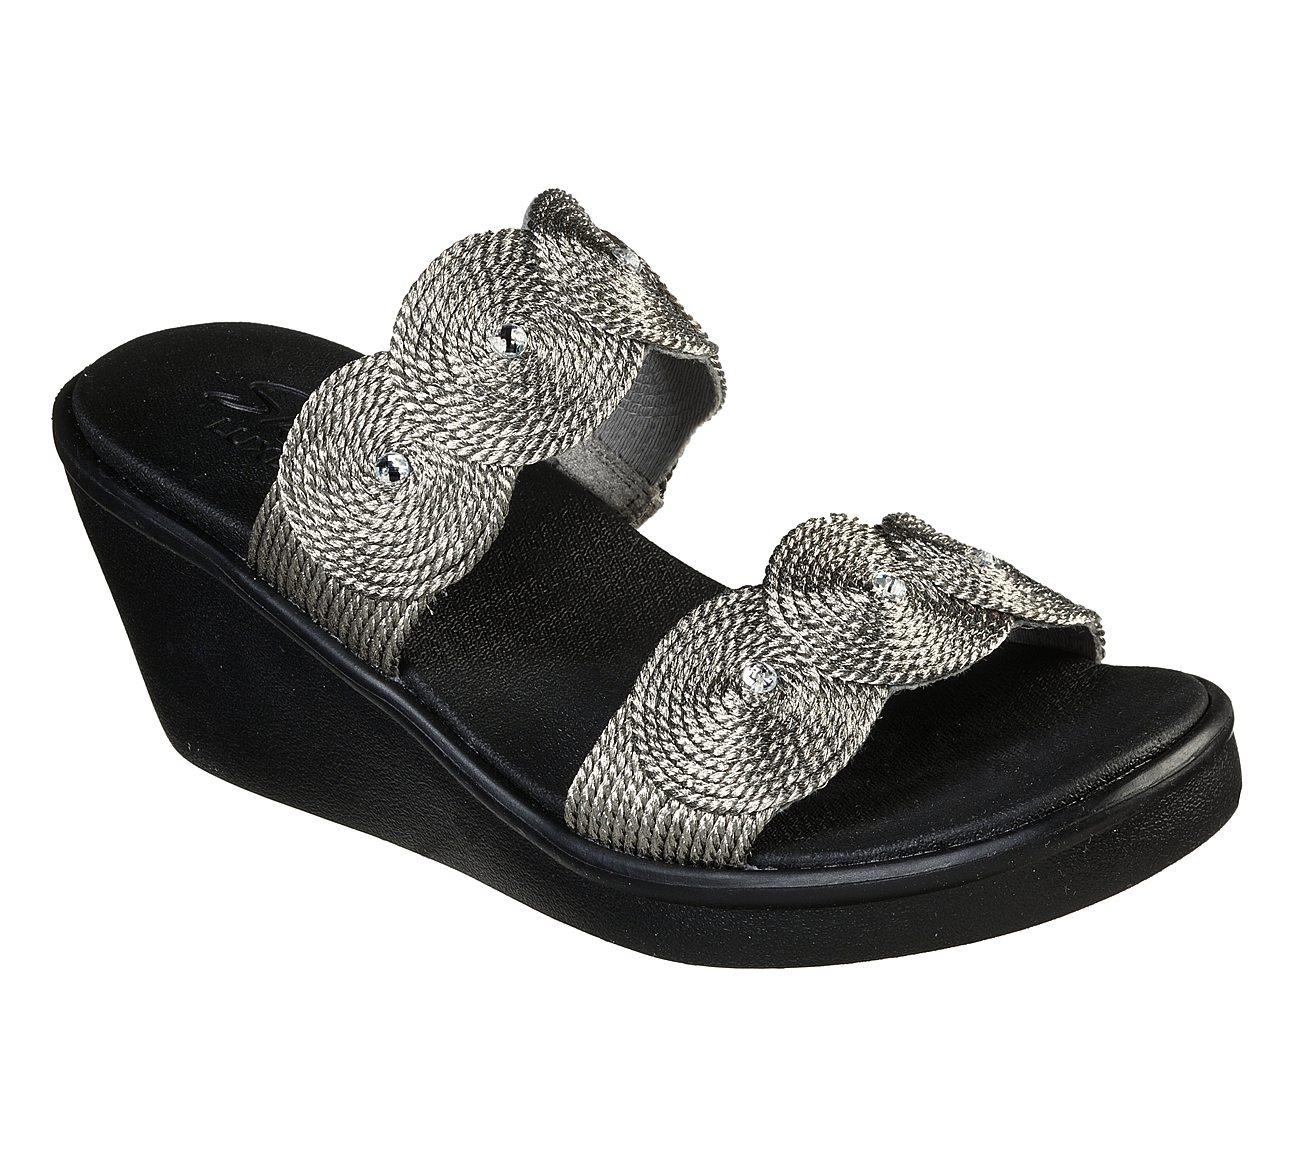 Obediente montar Asombrosamente  Buy SKECHERS Rumble On - Circle City Cali Shoes